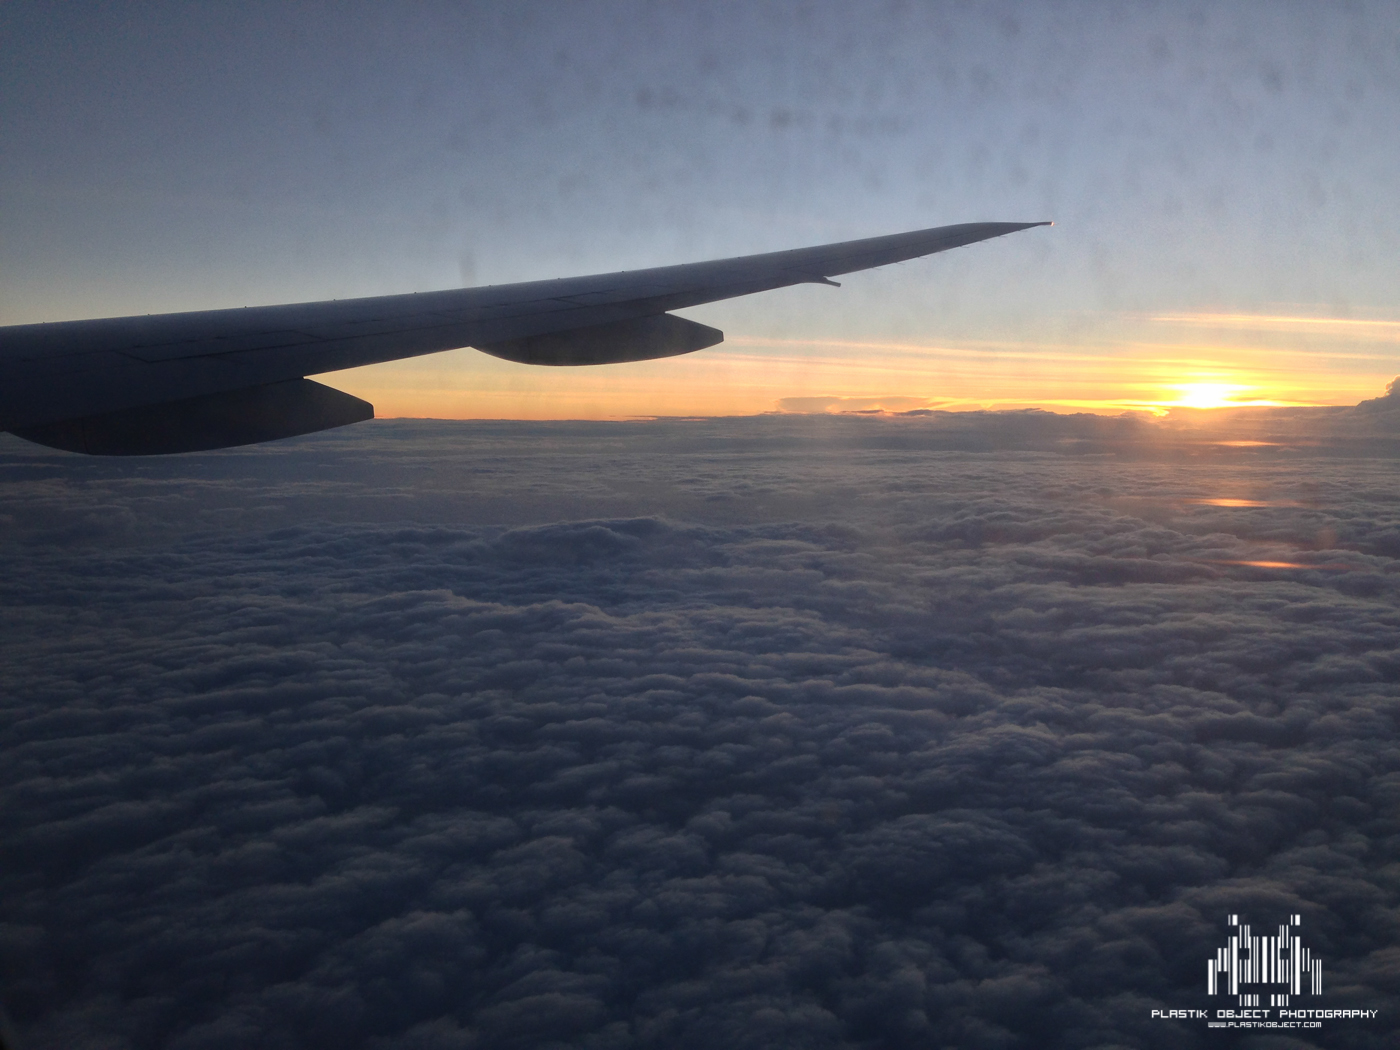 Sunset somewhere over Ethiopia.